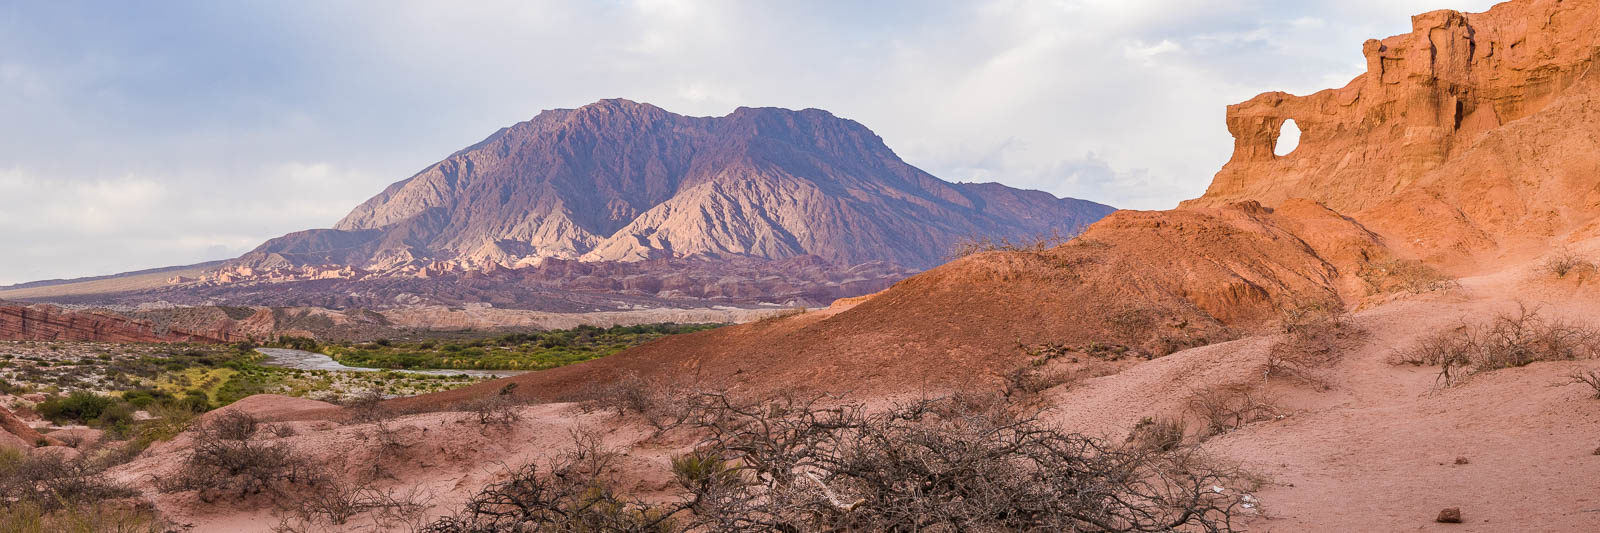 Quebrada de las Conchas: road trip from Salta to Cafayate Argentina